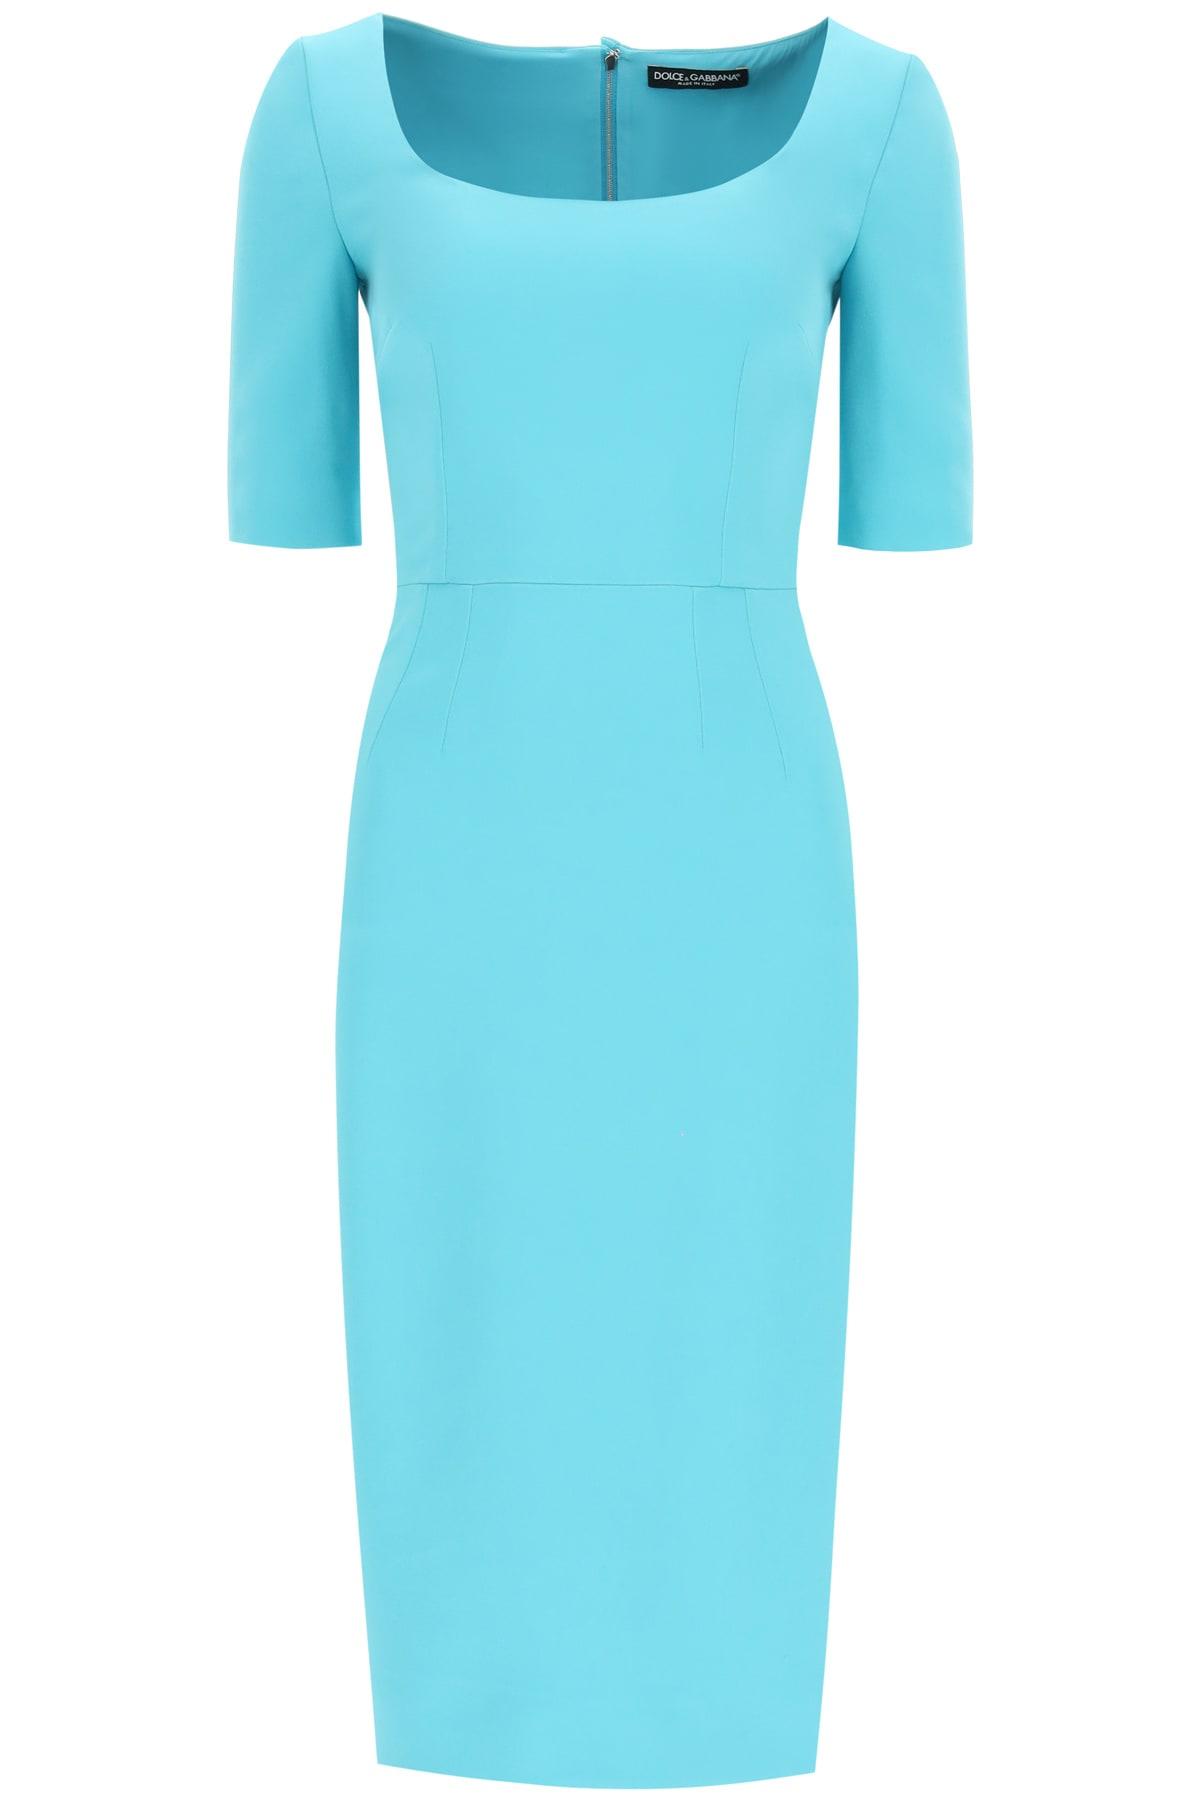 Buy Dolce & Gabbana Cady Midi Dress online, shop Dolce & Gabbana with free shipping